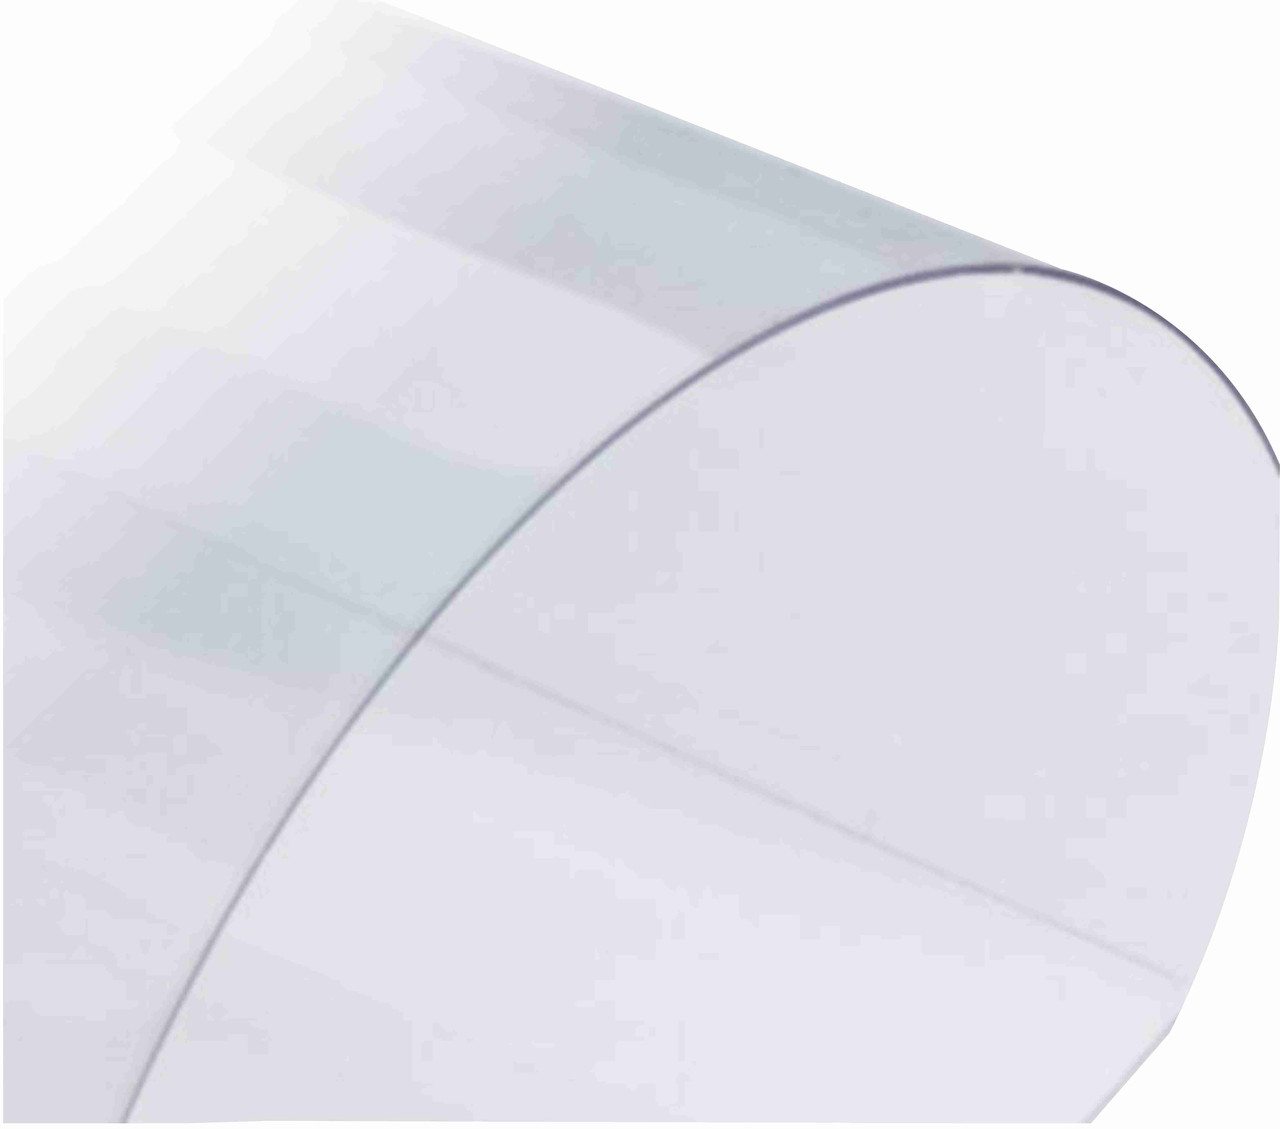 Прозрачный, жесткий листовой PVC пластик (1,5 мм) 1,22м х2,44м